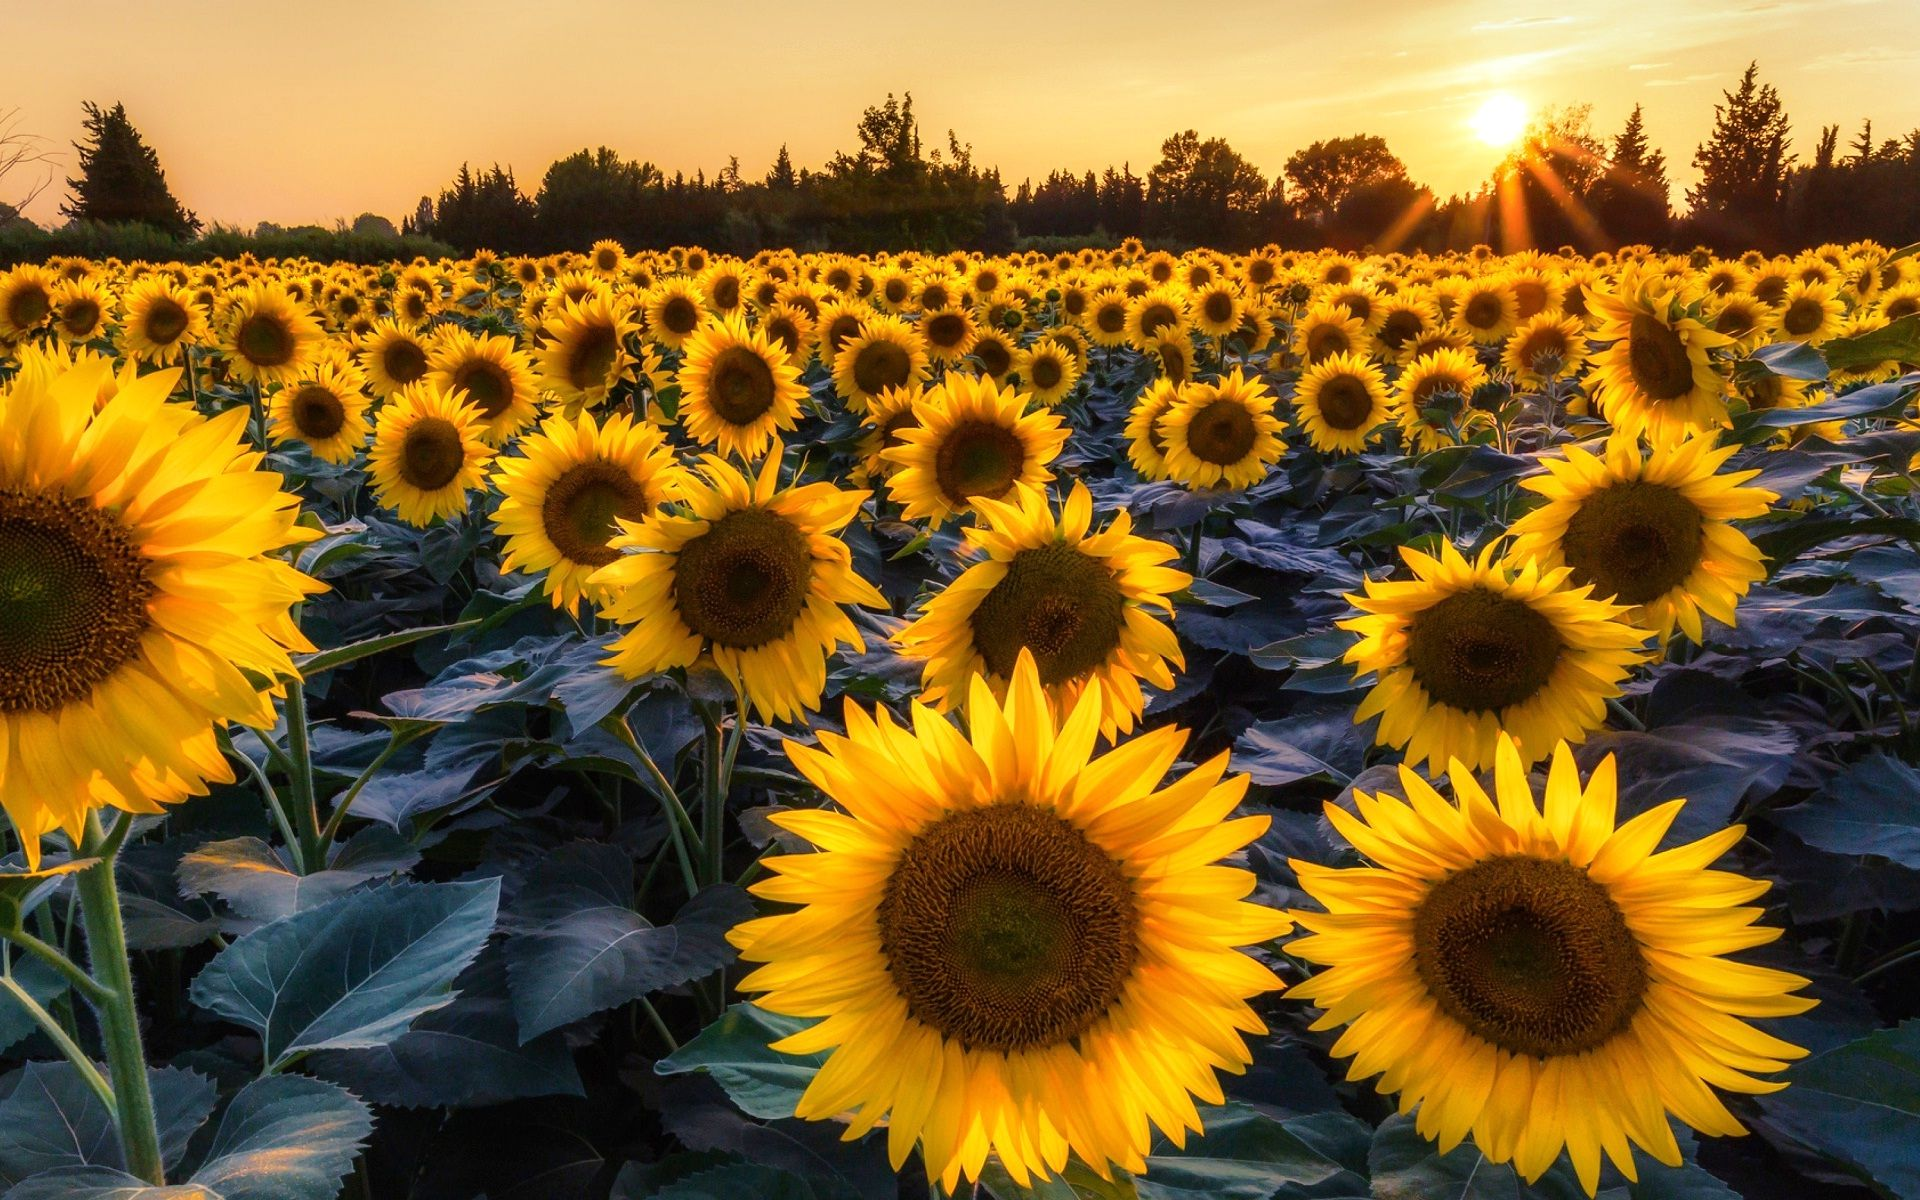 Sunflowers garden with sunshine New hd wallpaper